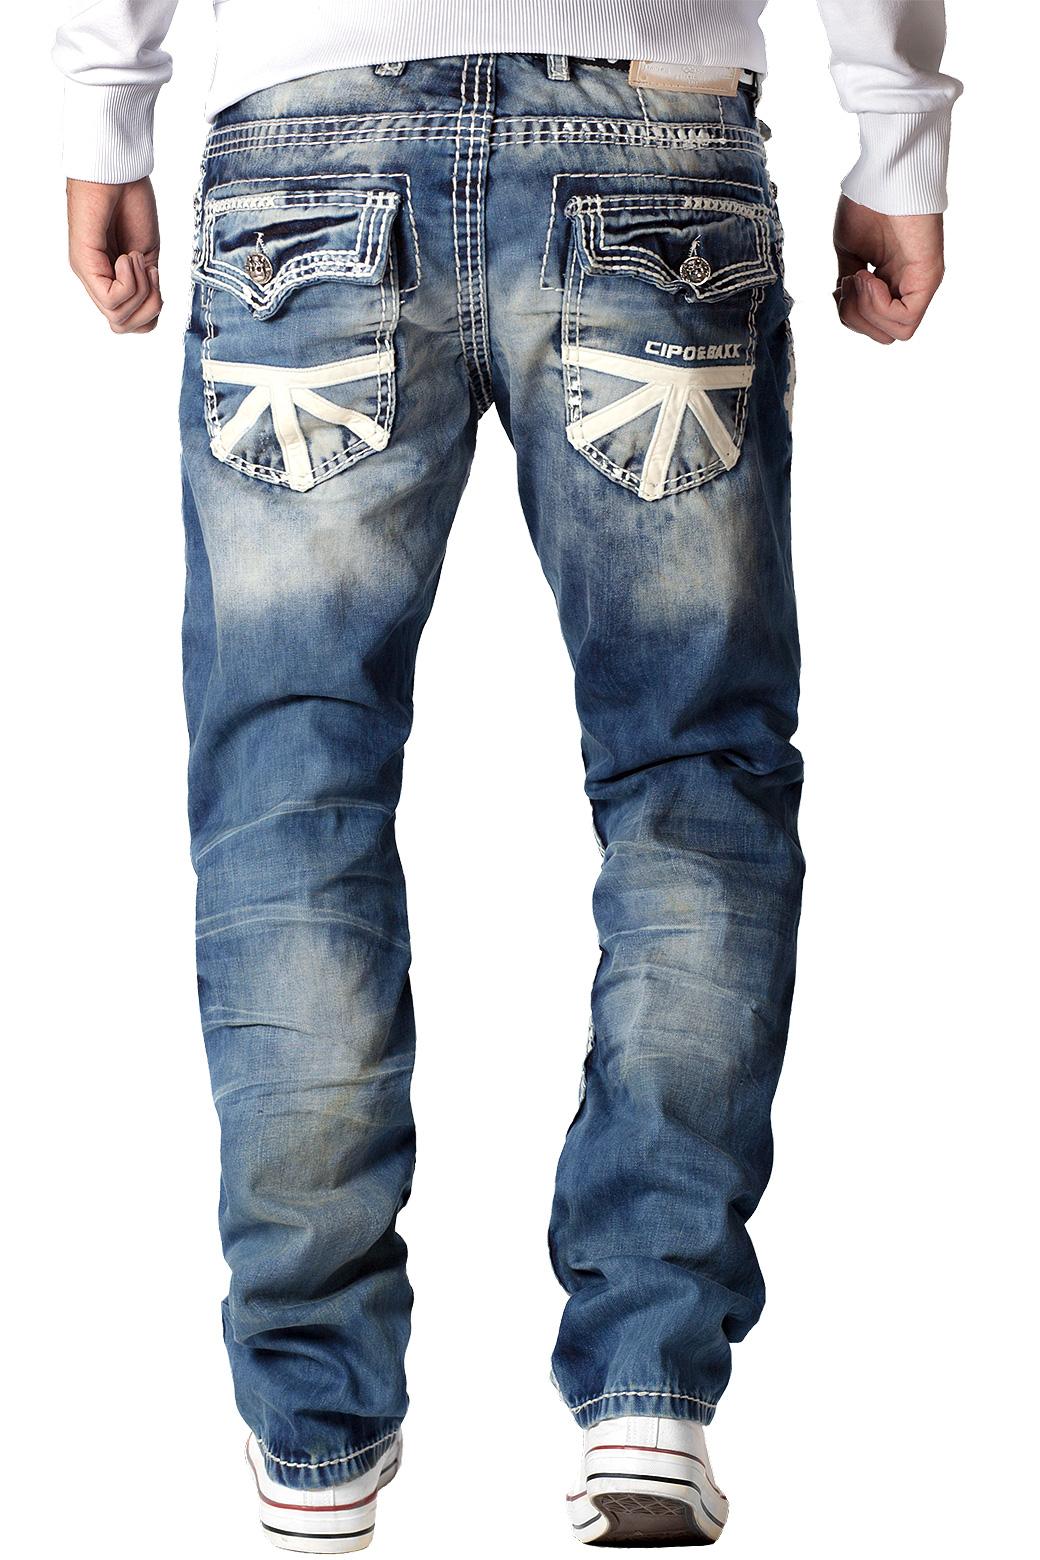 Cipo-amp-Baxx-Uomo-Jeans-Pantaloni-ricamate-Biker-Style-streetwear-nervature-pattern-Dope miniatura 10